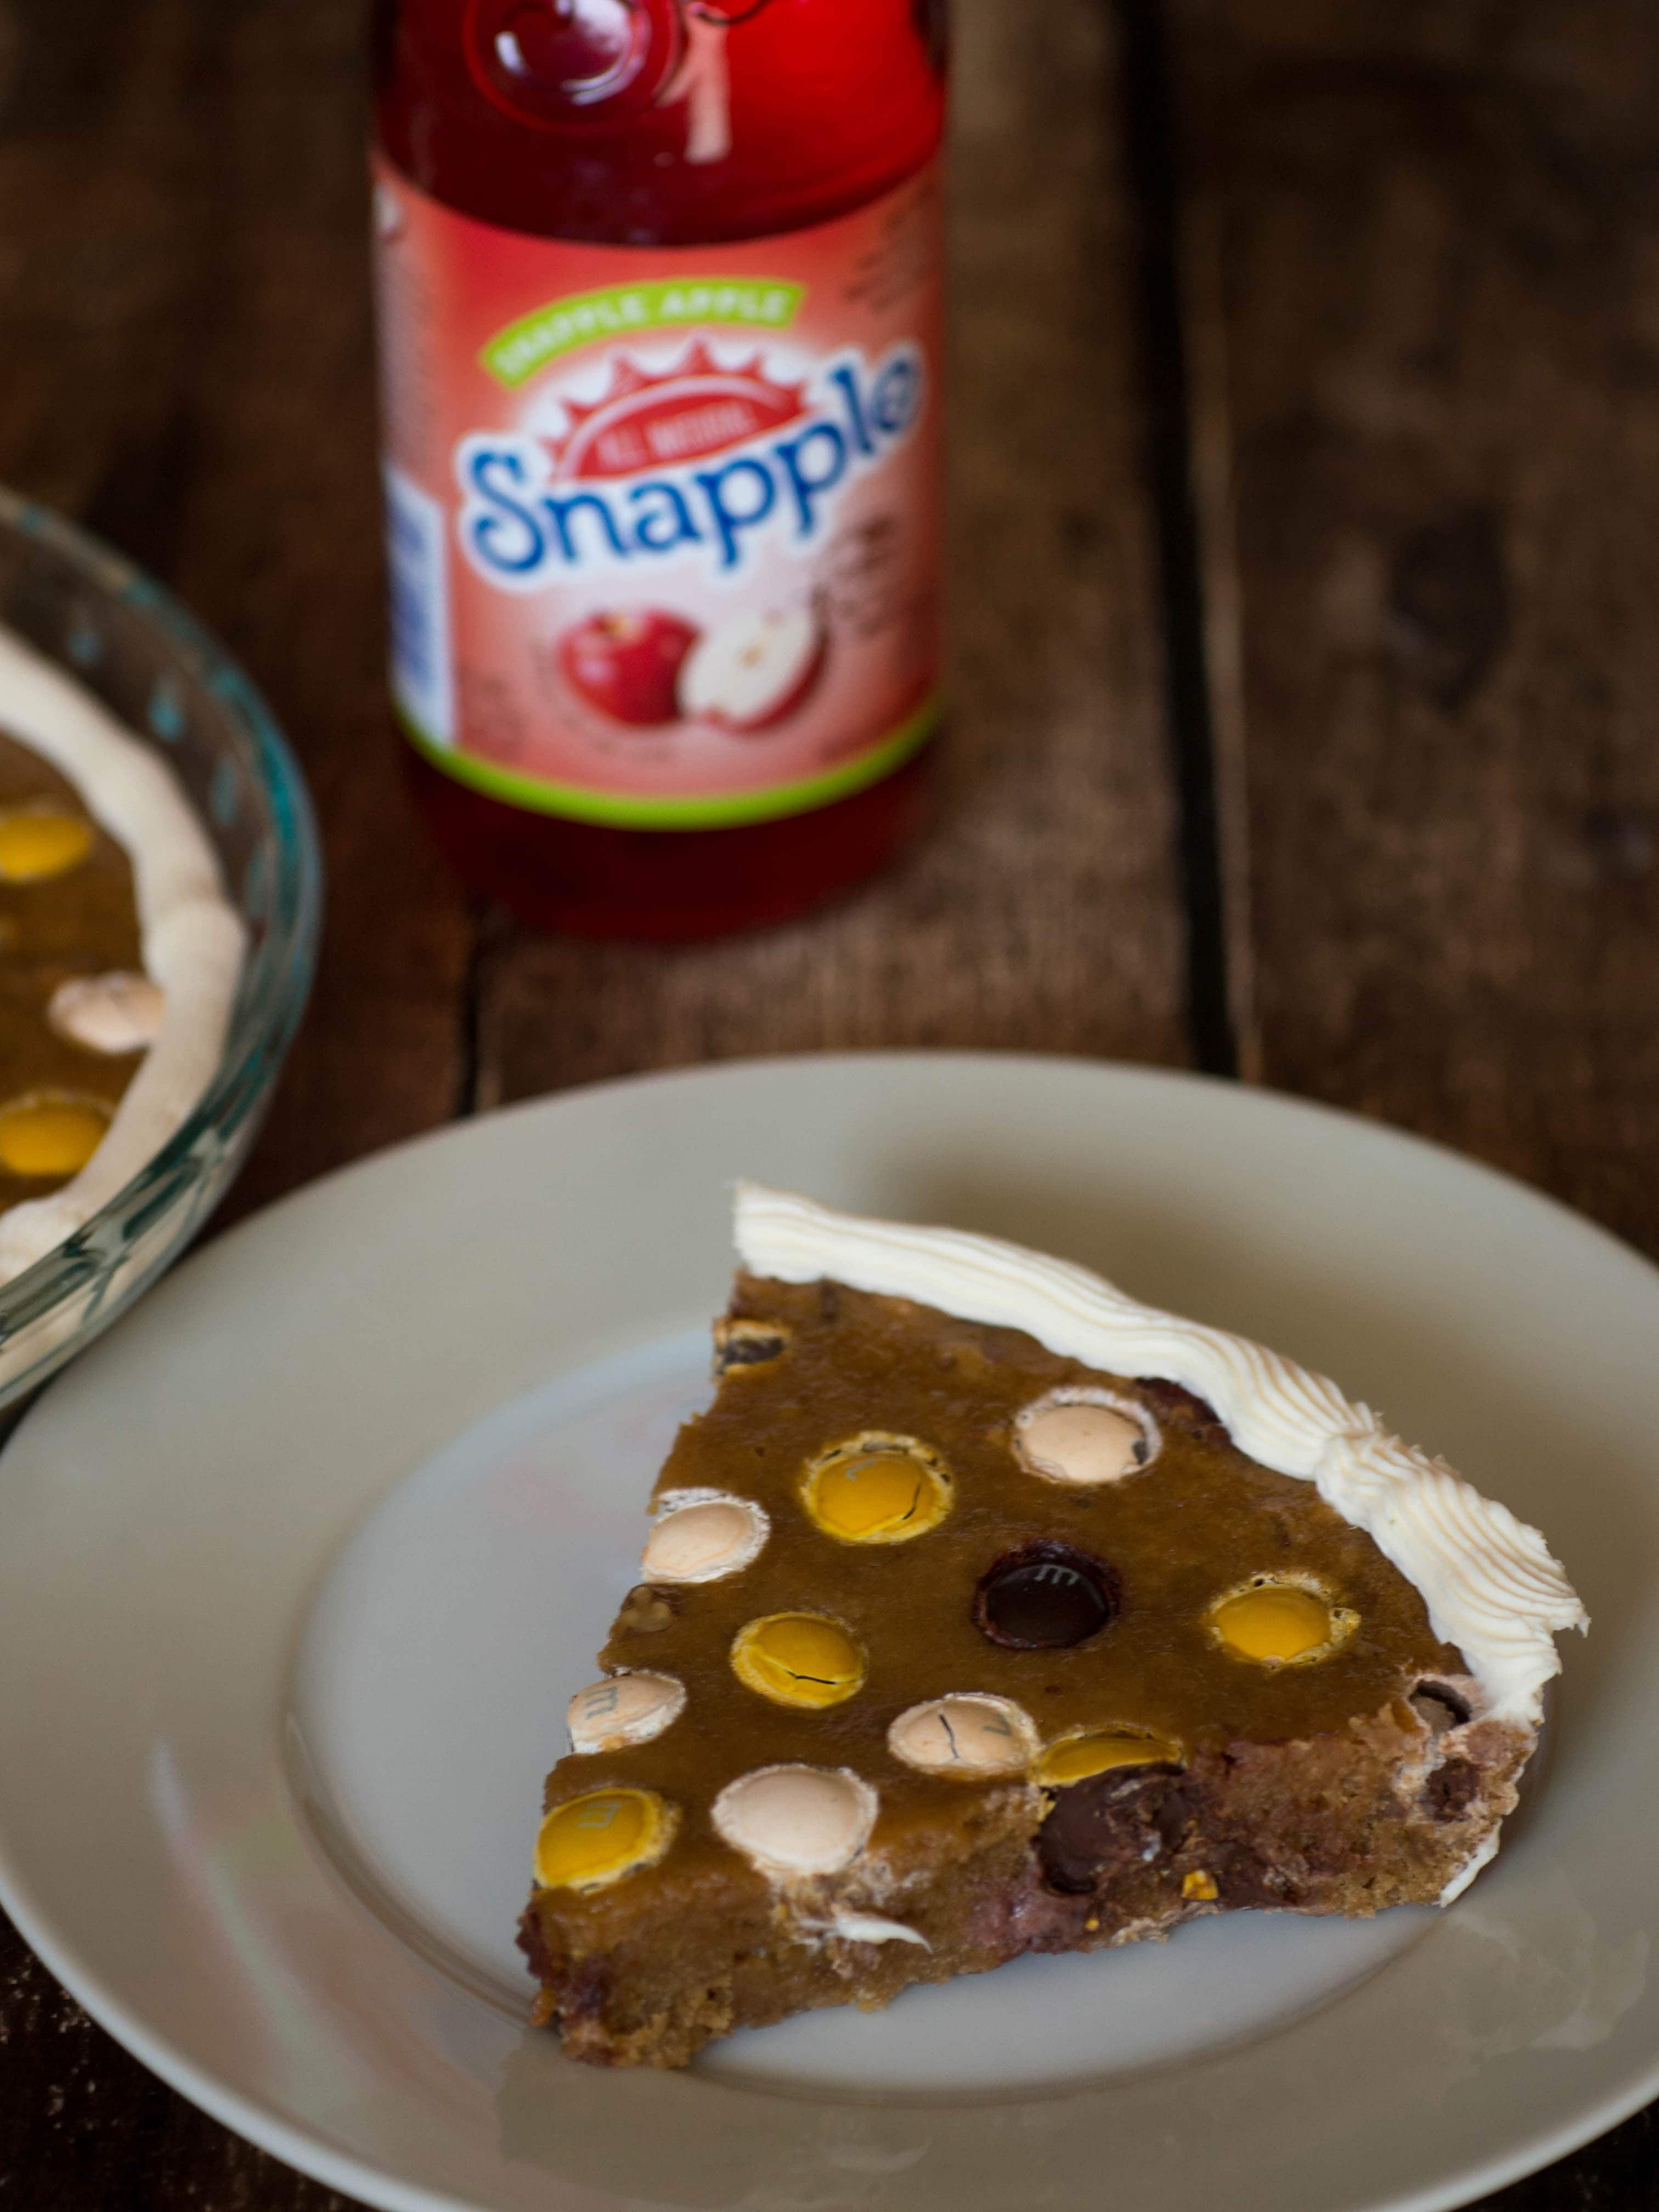 Pecan Cookie Pie with Snapple Apple